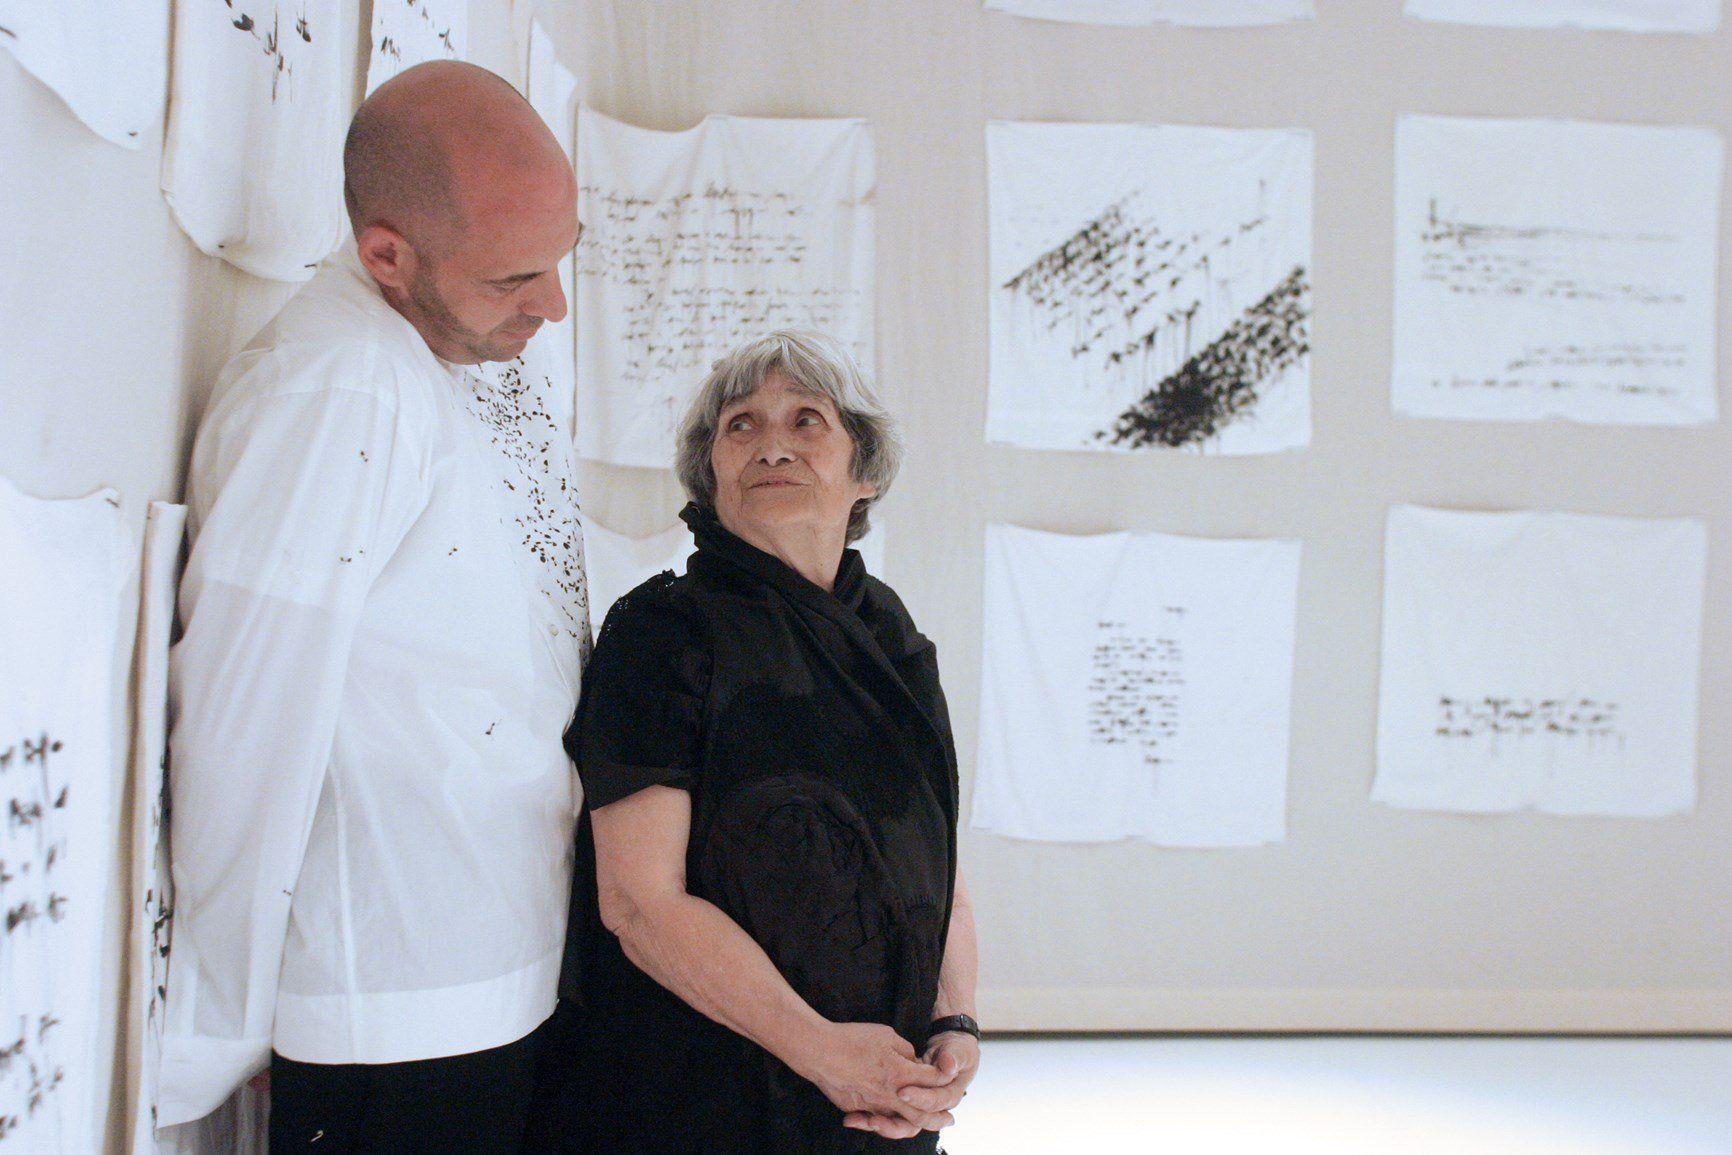 Maria Lai e Antonio Marras Alghero 2003 ©daniela zedda